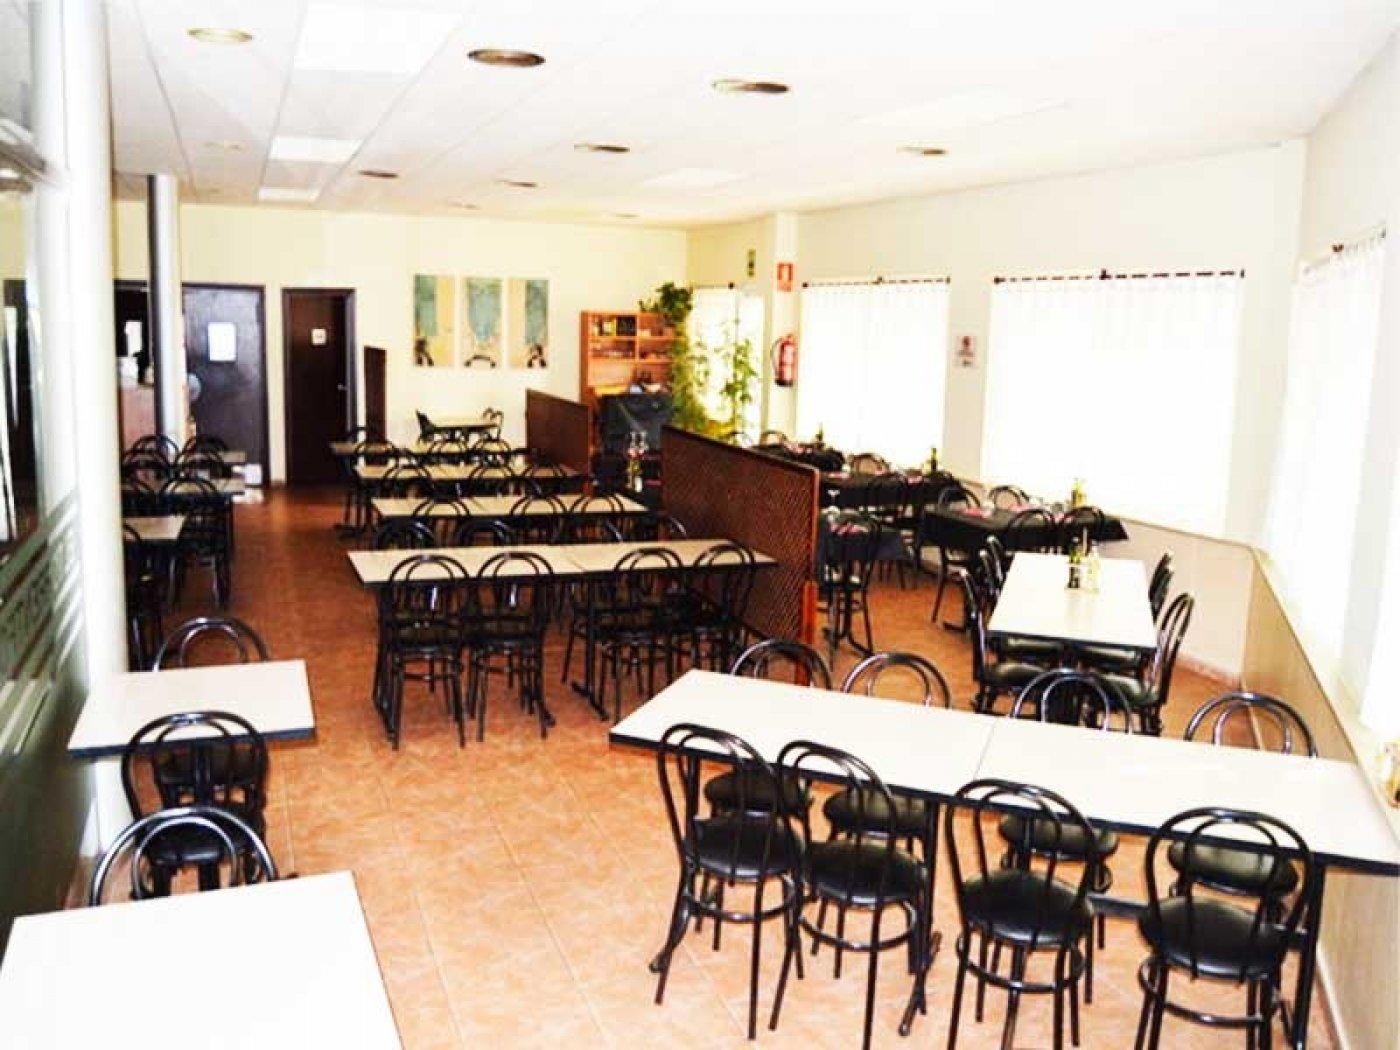 Nave restaurante en polígono cerca de sant sadurní d´anoia - imagenInmueble7